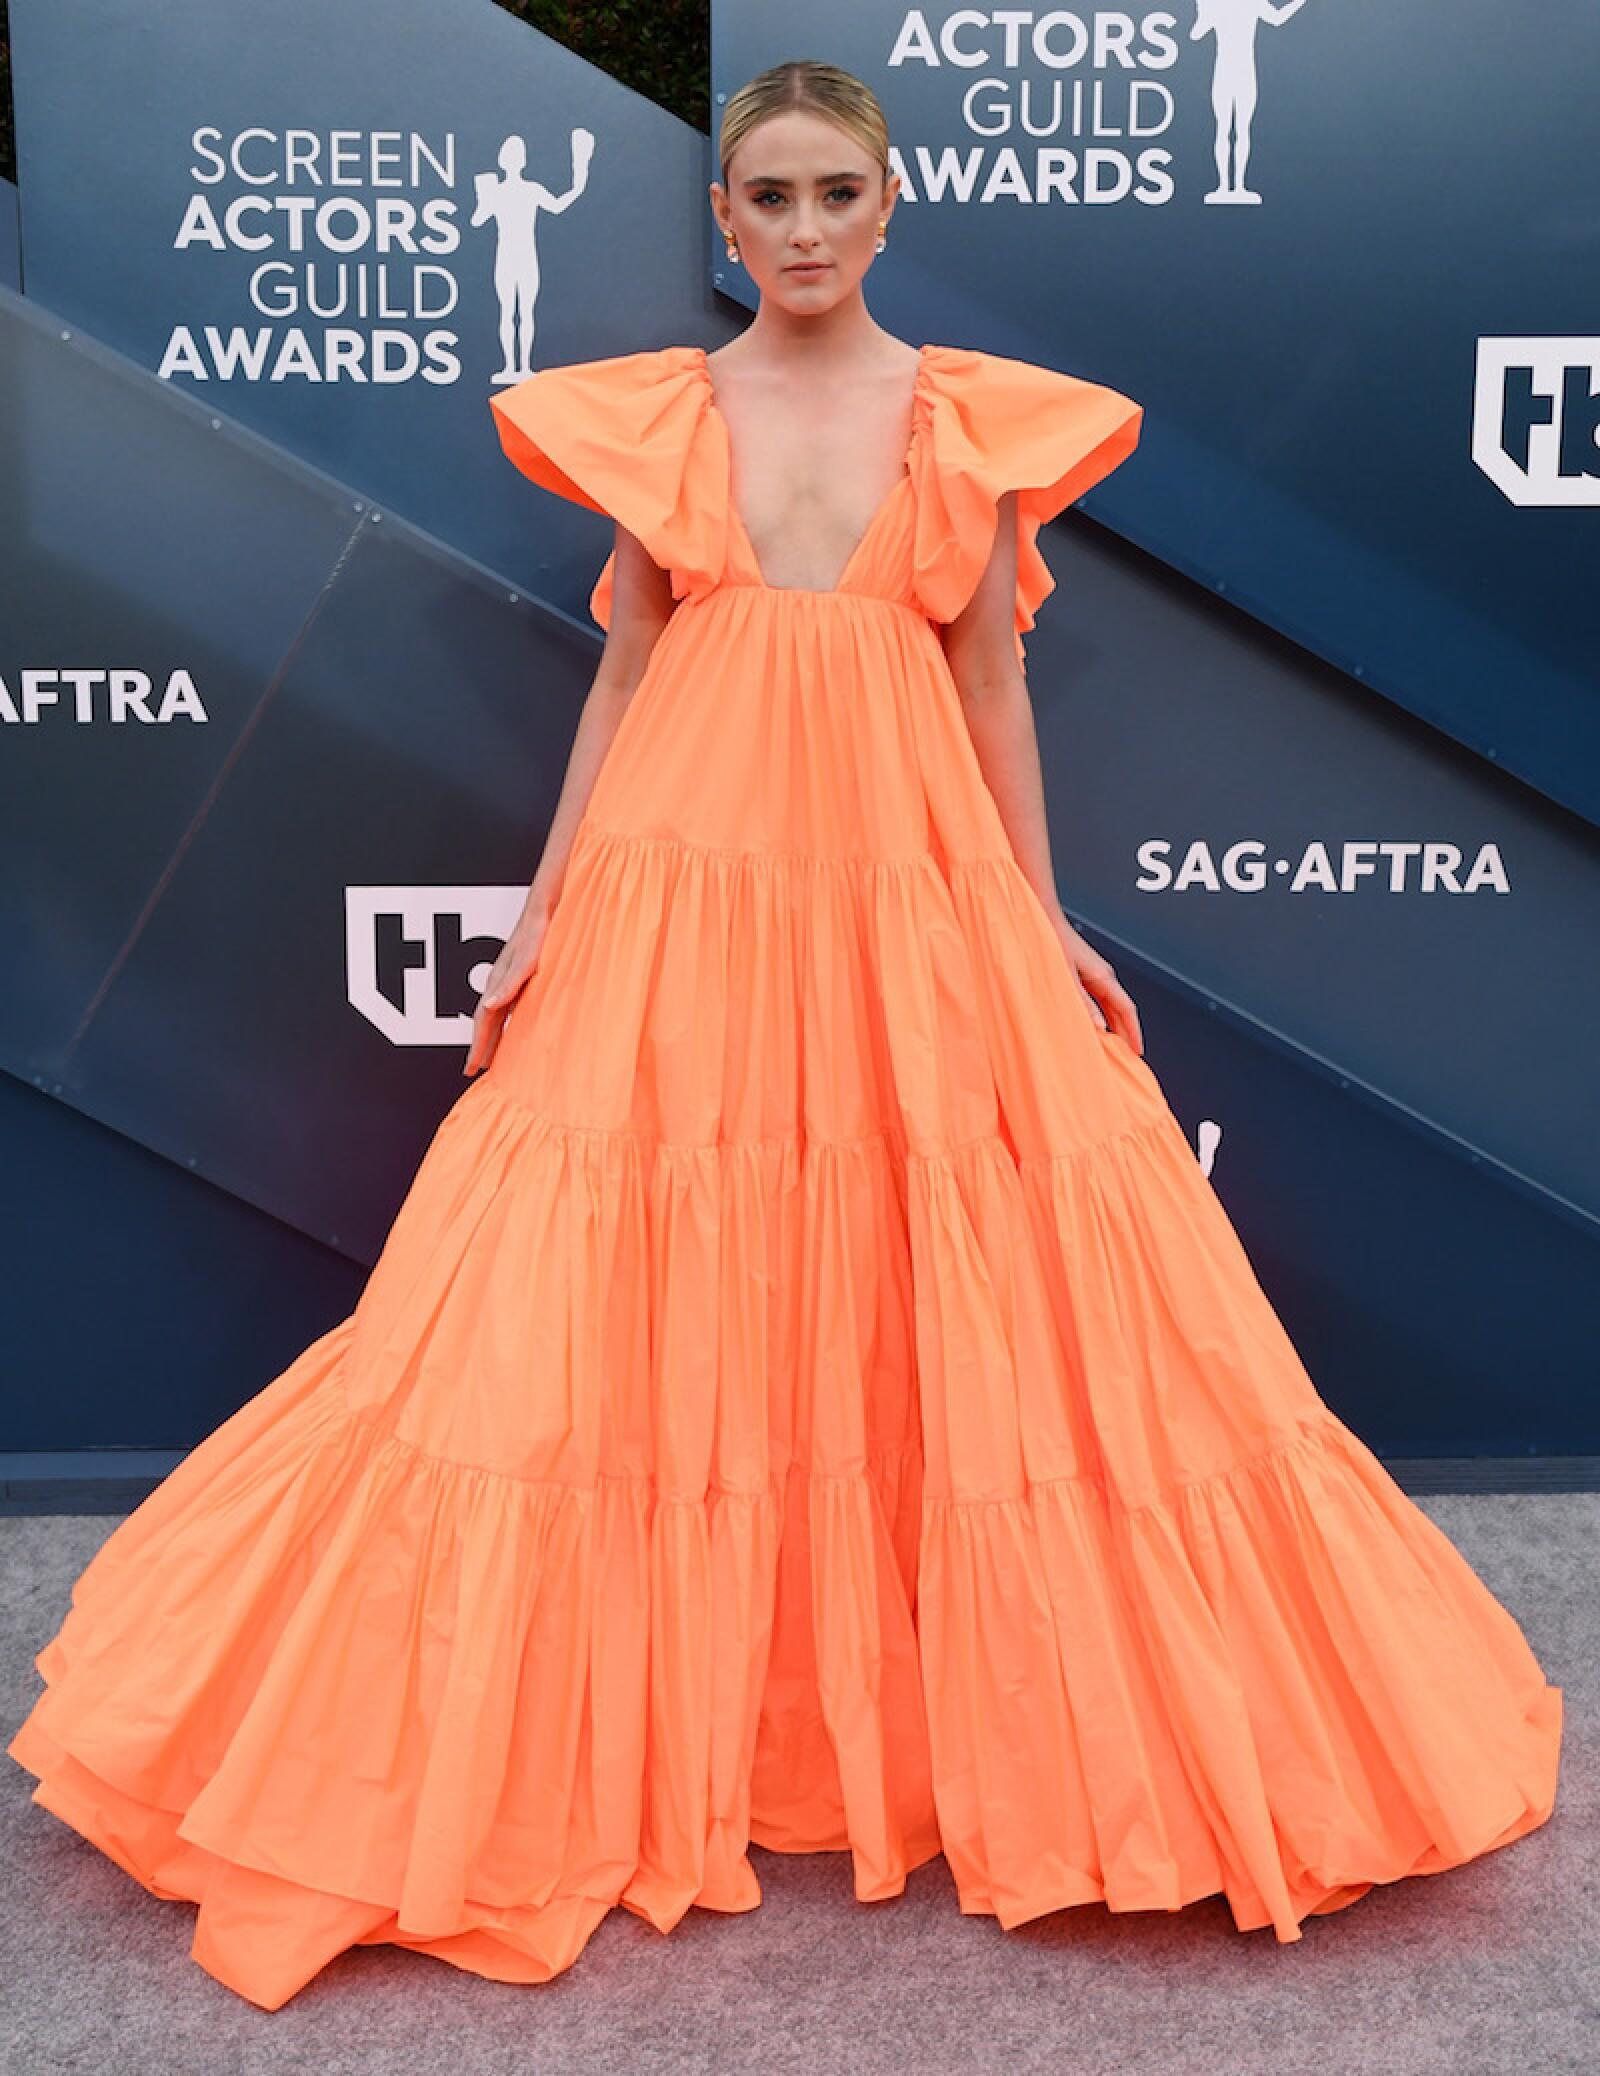 26th Annual Screen Actors Guild Awards, Arrivals, Shrine Auditorium, Los Angeles, USA - 19 Jan 2020